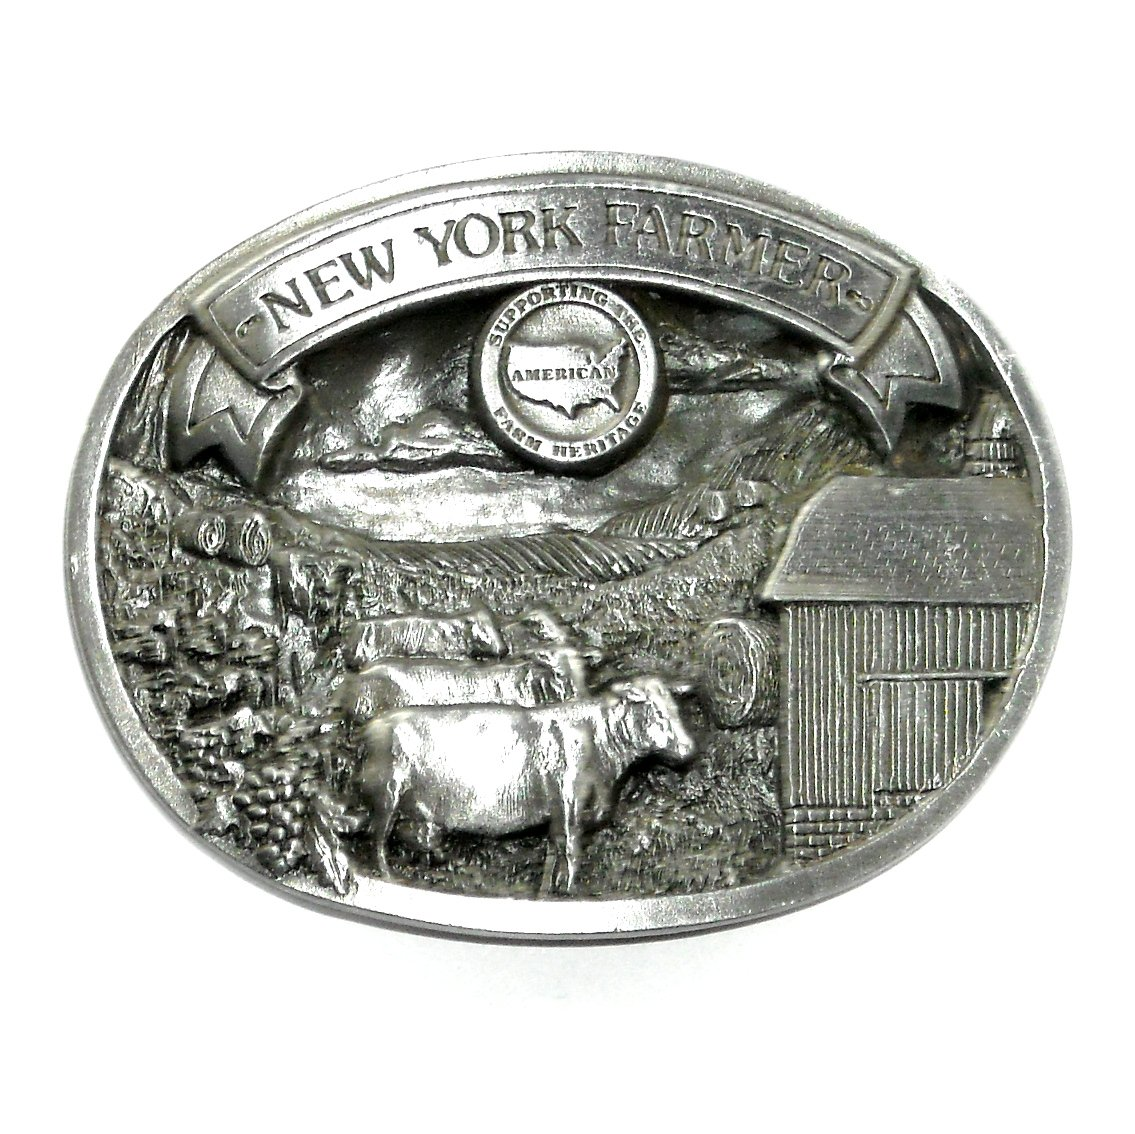 New York Farmer American Farm Heritage 3D Limited Edition Pewter Belt Buckle 1987